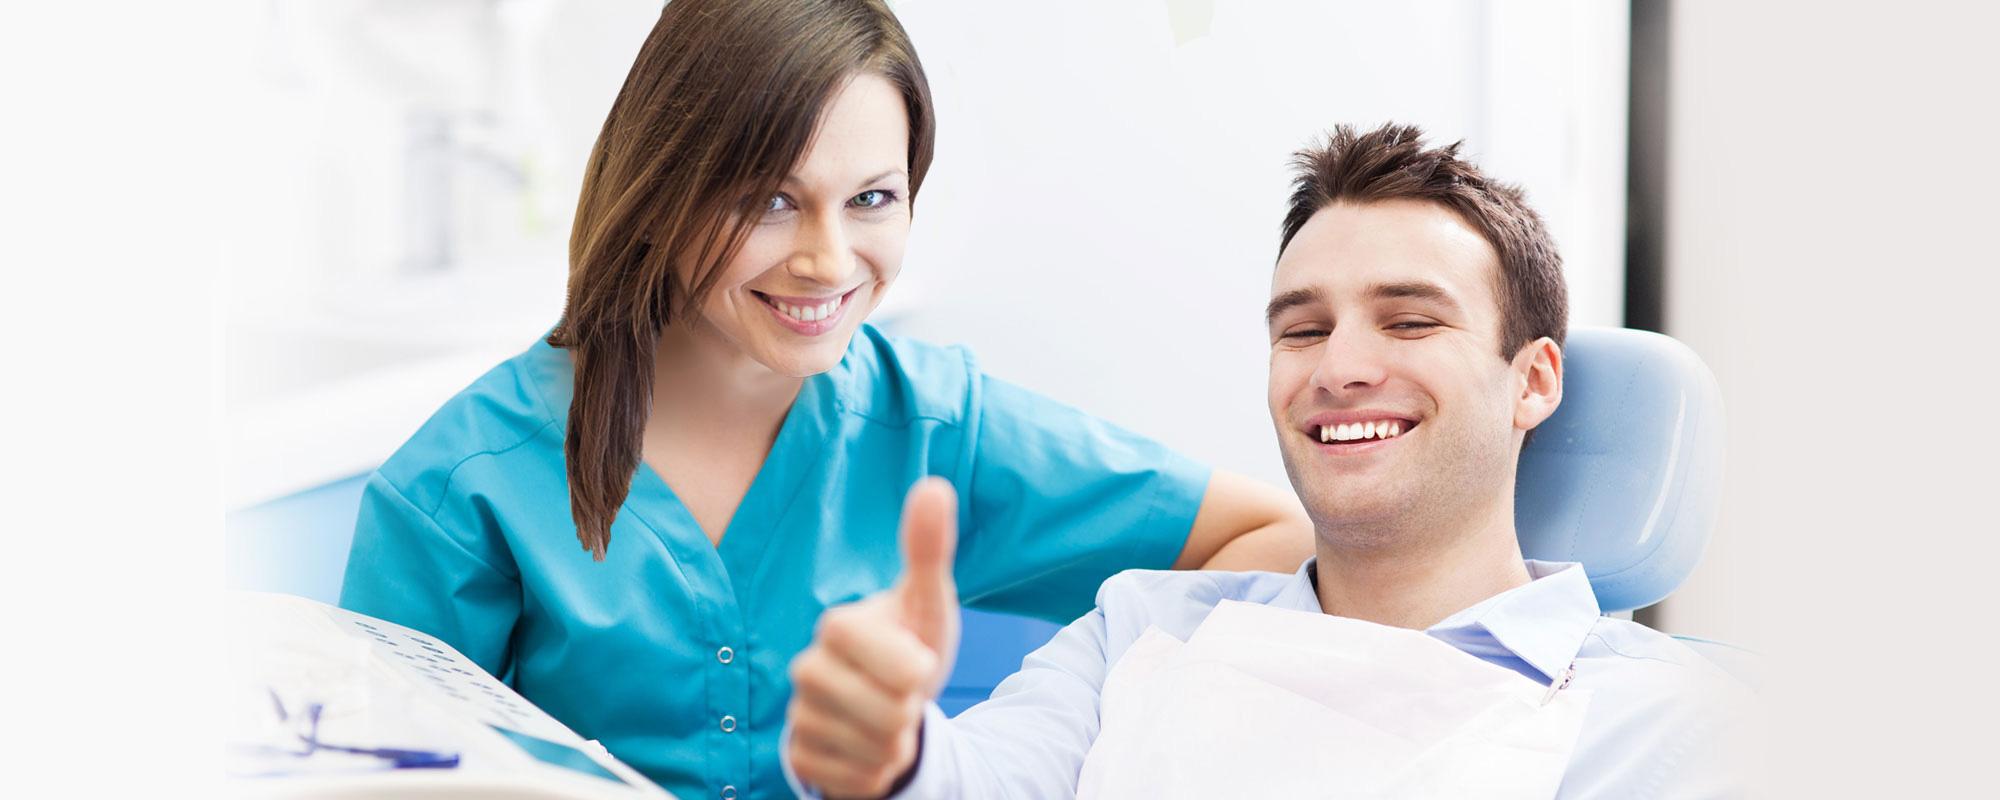 Profesjonalne gabinety stomatologiczne